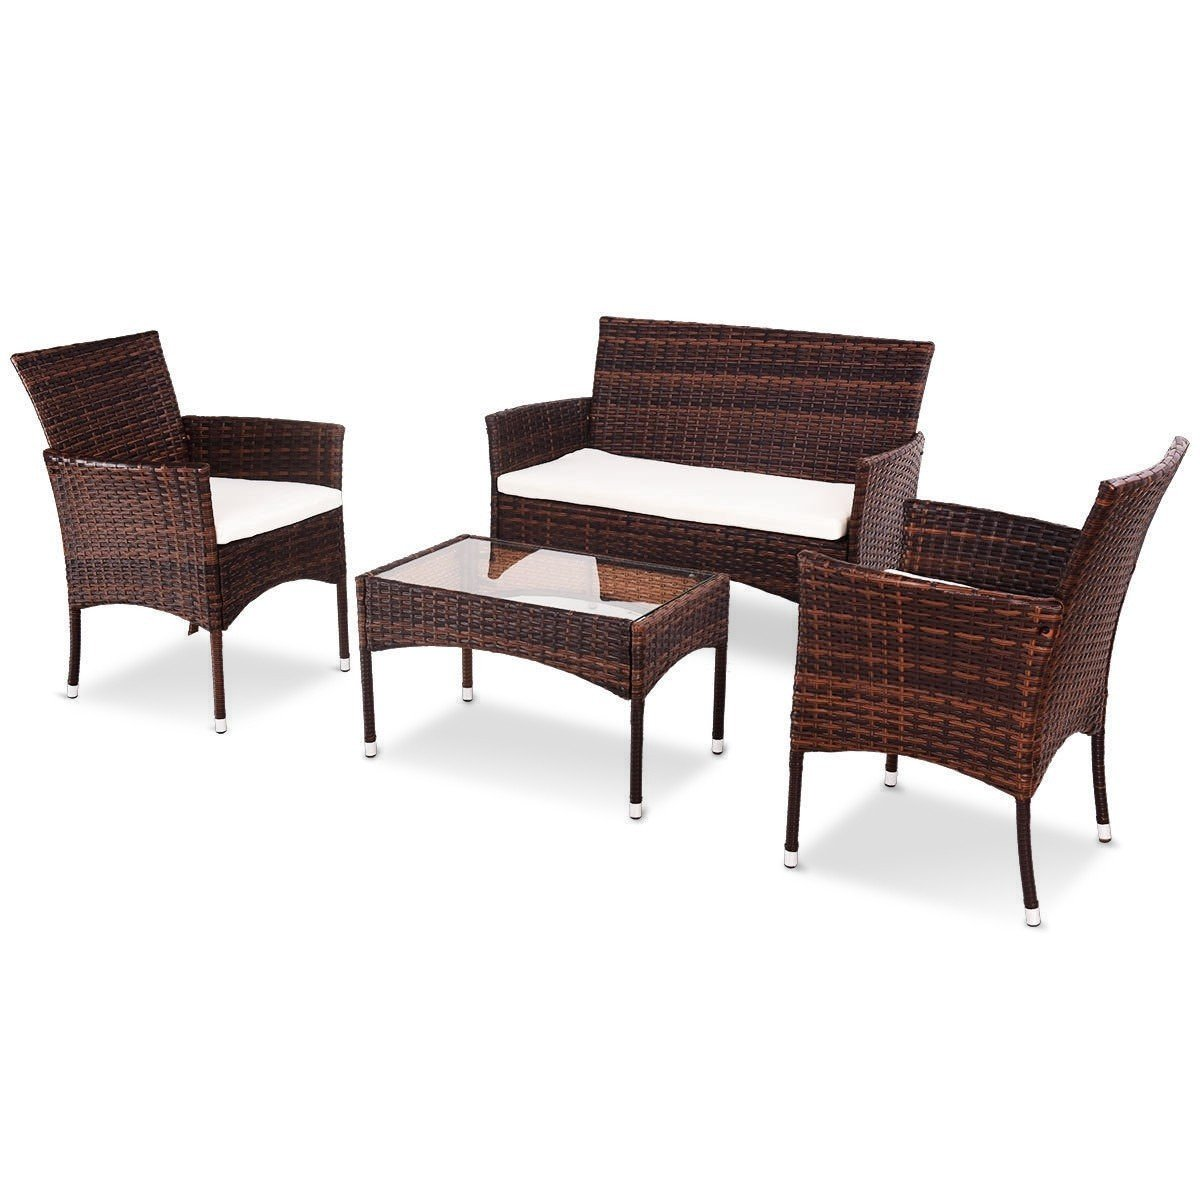 EnjoyShop 4 Pcs PE Rattan Wicker Table Shelf Sofa Furniture Set with Cushion Dining Garden Picnic Outdoor